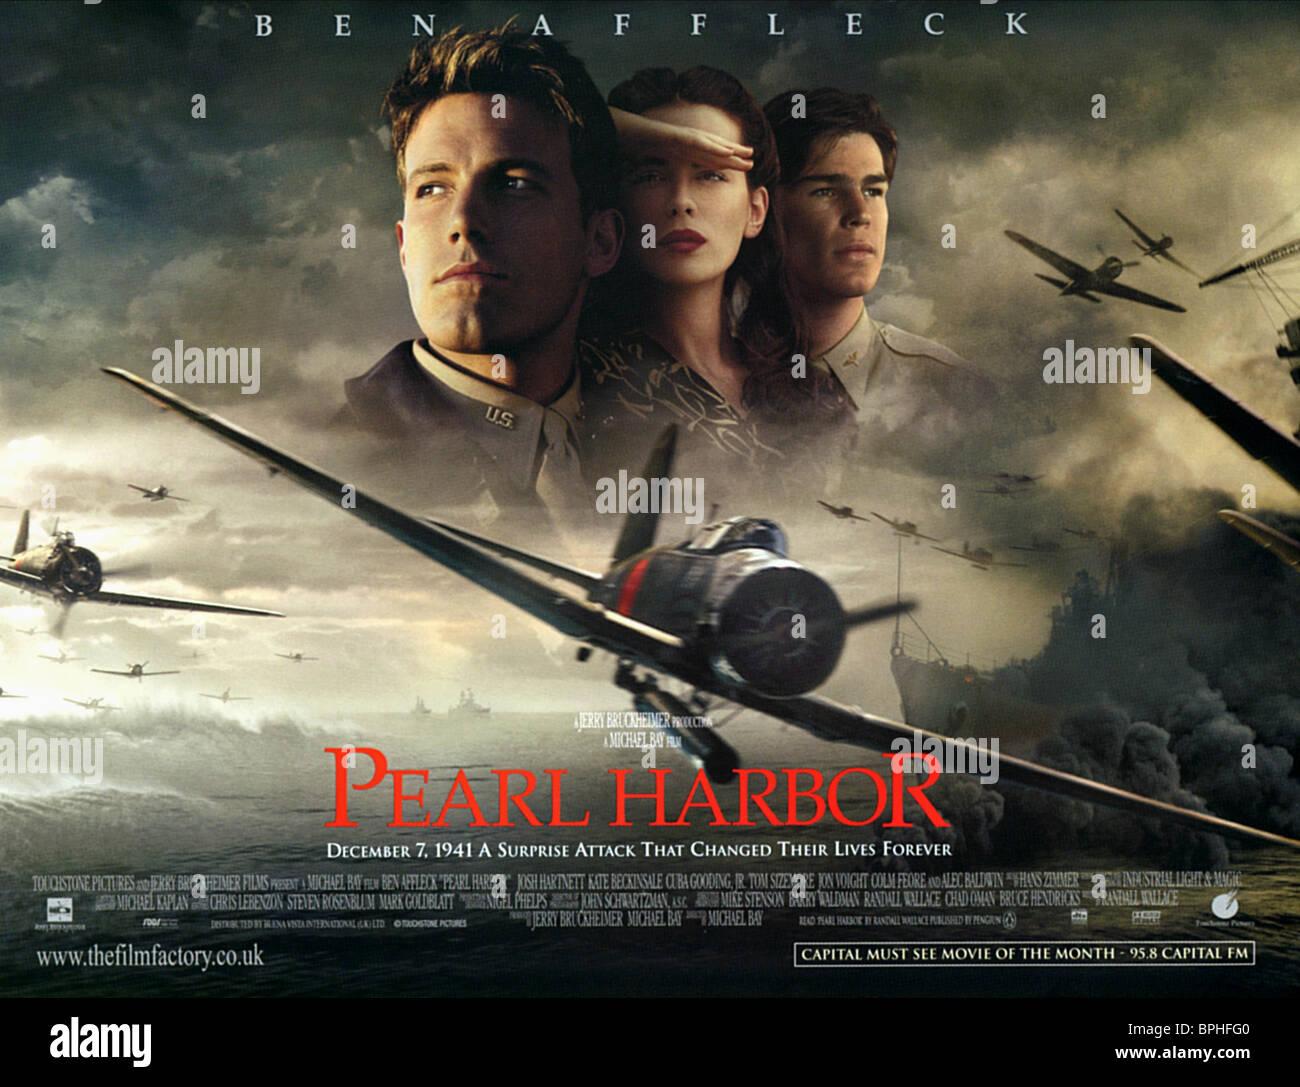 Ben Affleck Kate Beckinsale Josh Hartnett Poster Pearl Harbor Stock Photo Alamy